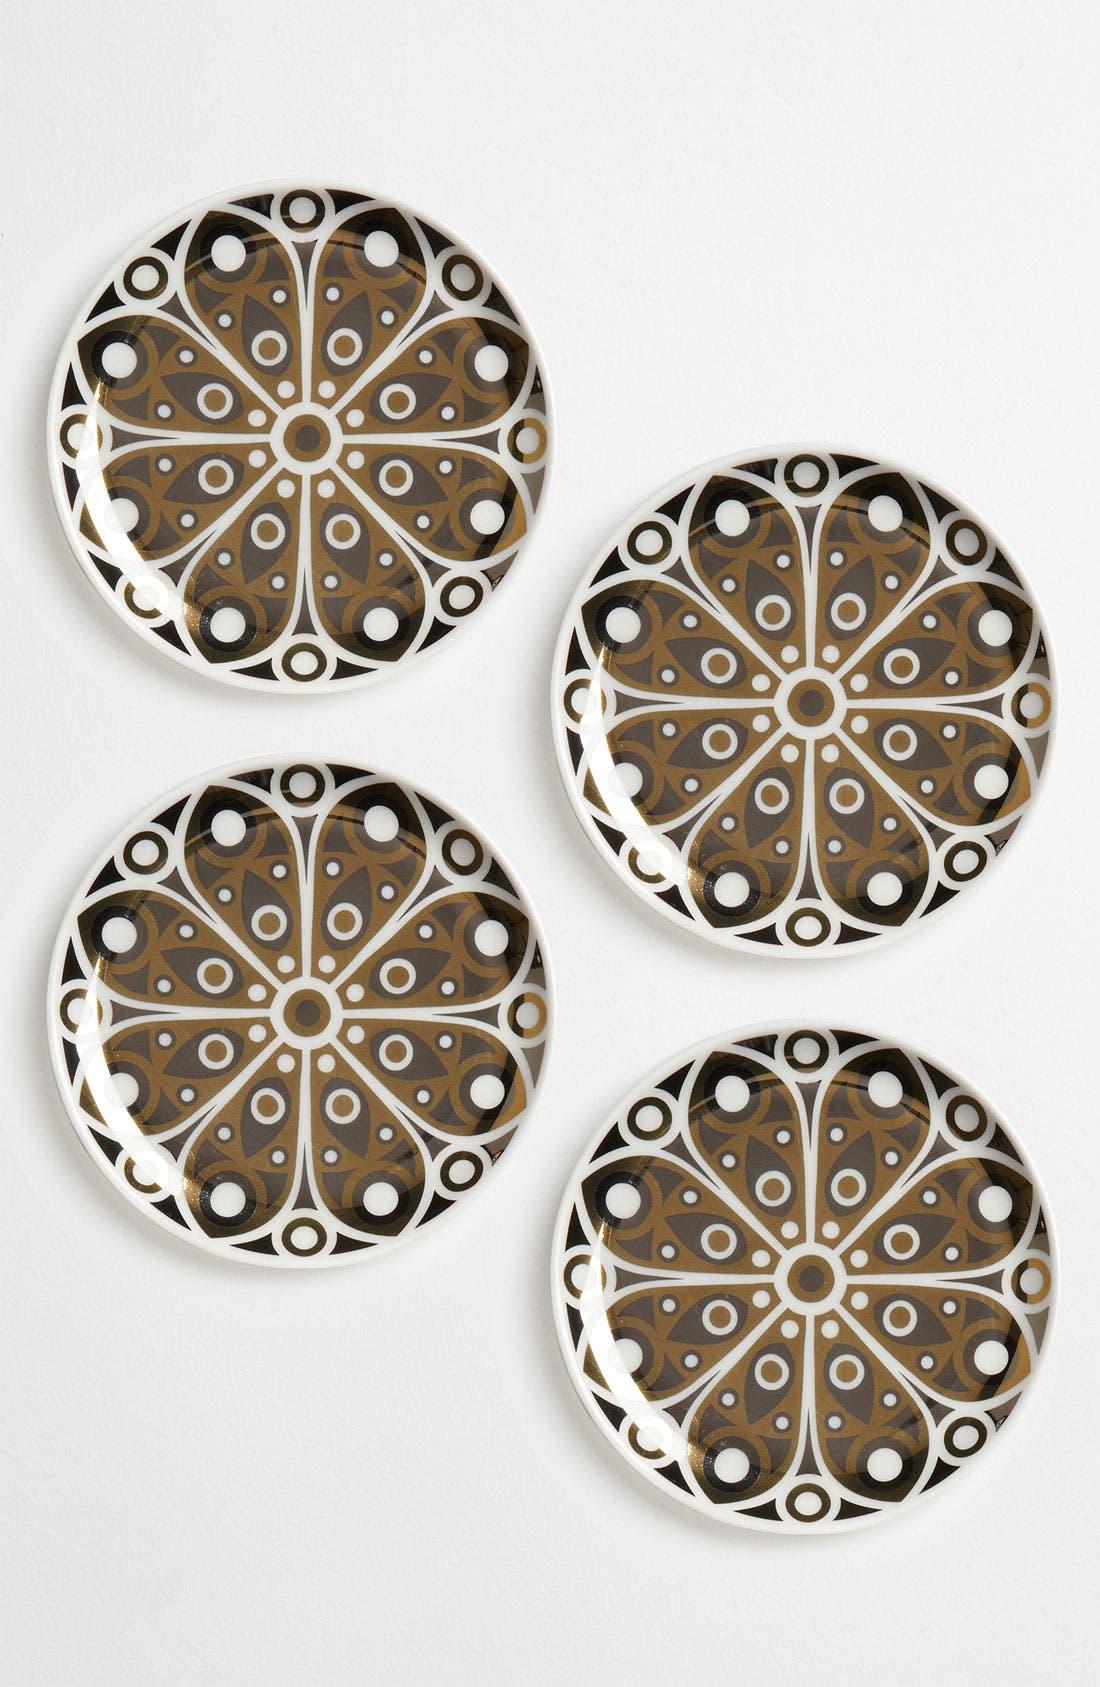 Main Image - Jonathan Adler 'Peacock' Porcelain Coasters (Set of 4)